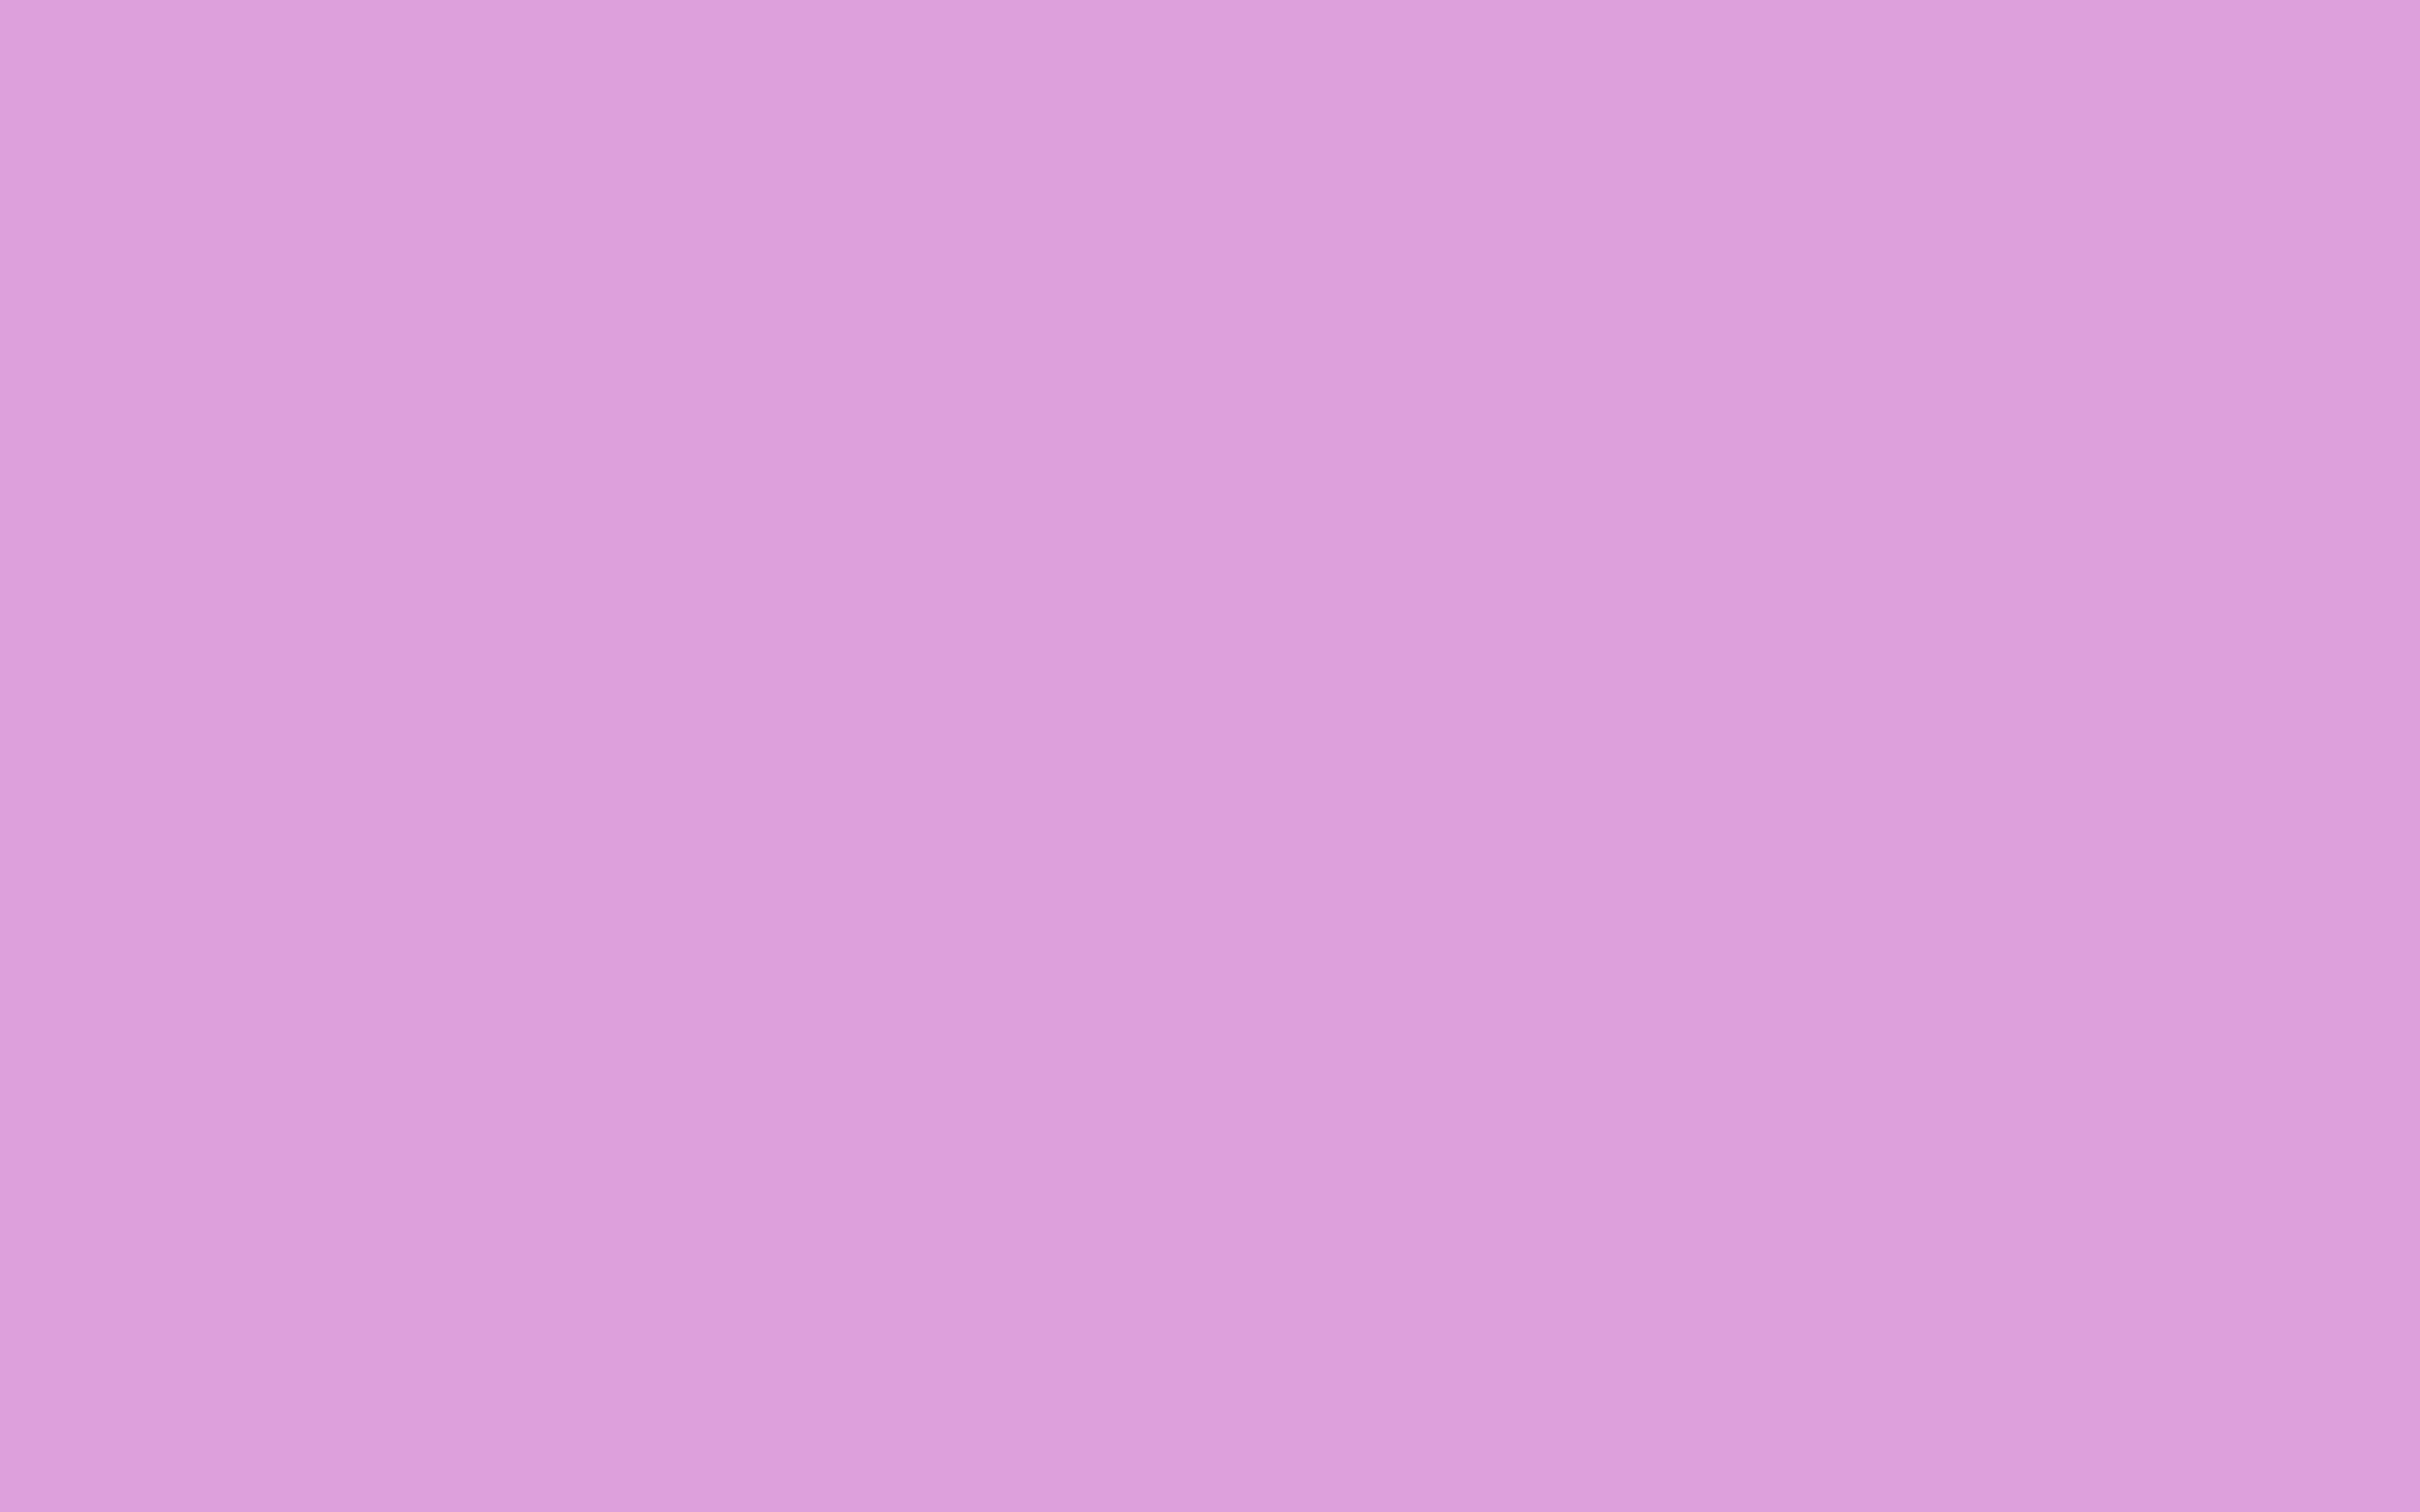 2560x1600 Plum Web Solid Color Background